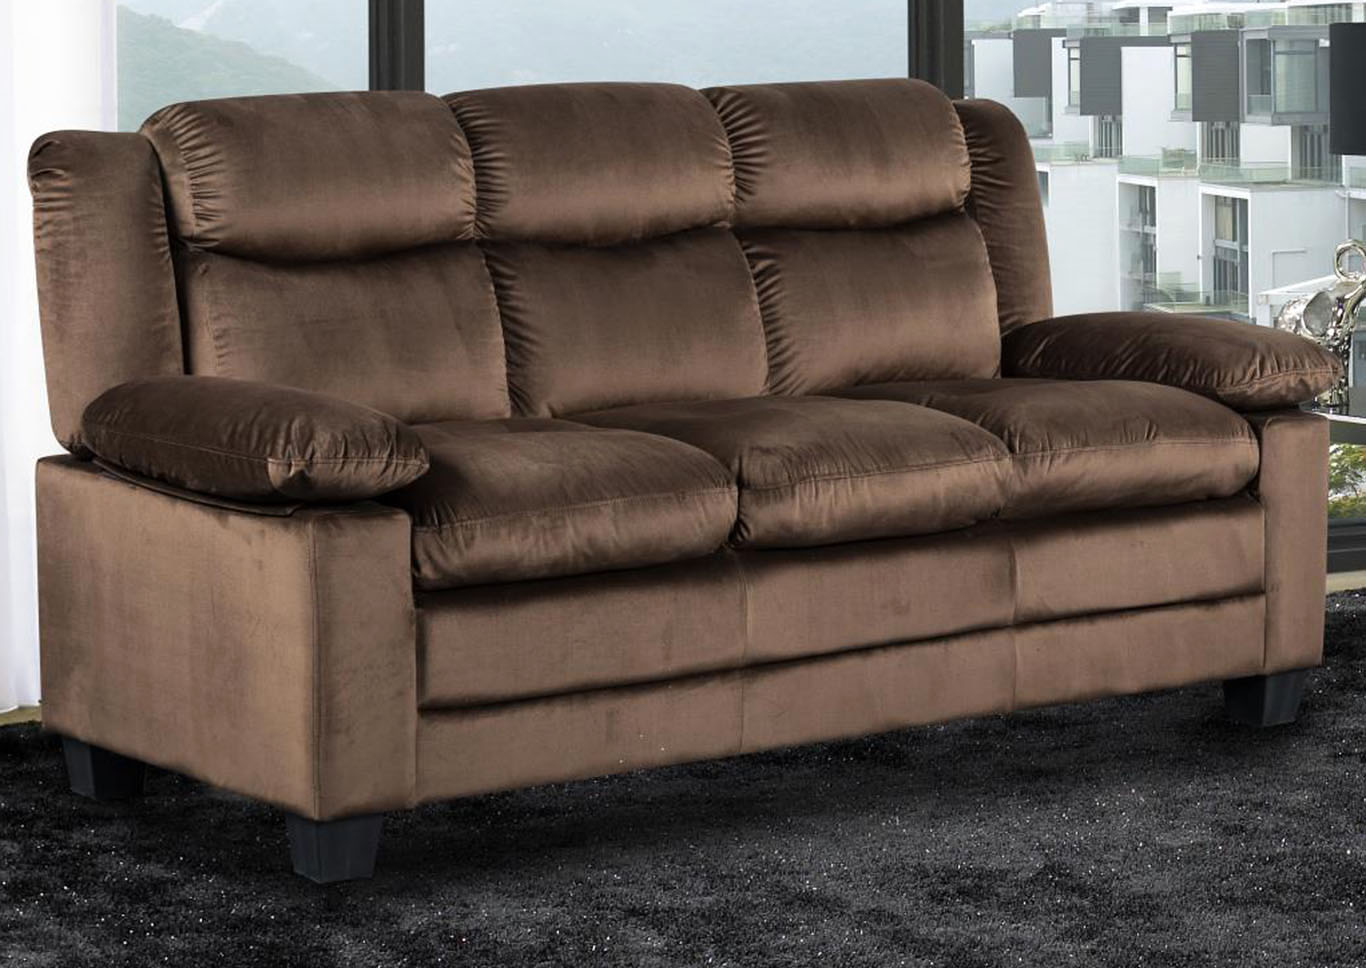 Fantastic Deals More Furniture Philadelphia Pa Silver Sofa Creativecarmelina Interior Chair Design Creativecarmelinacom